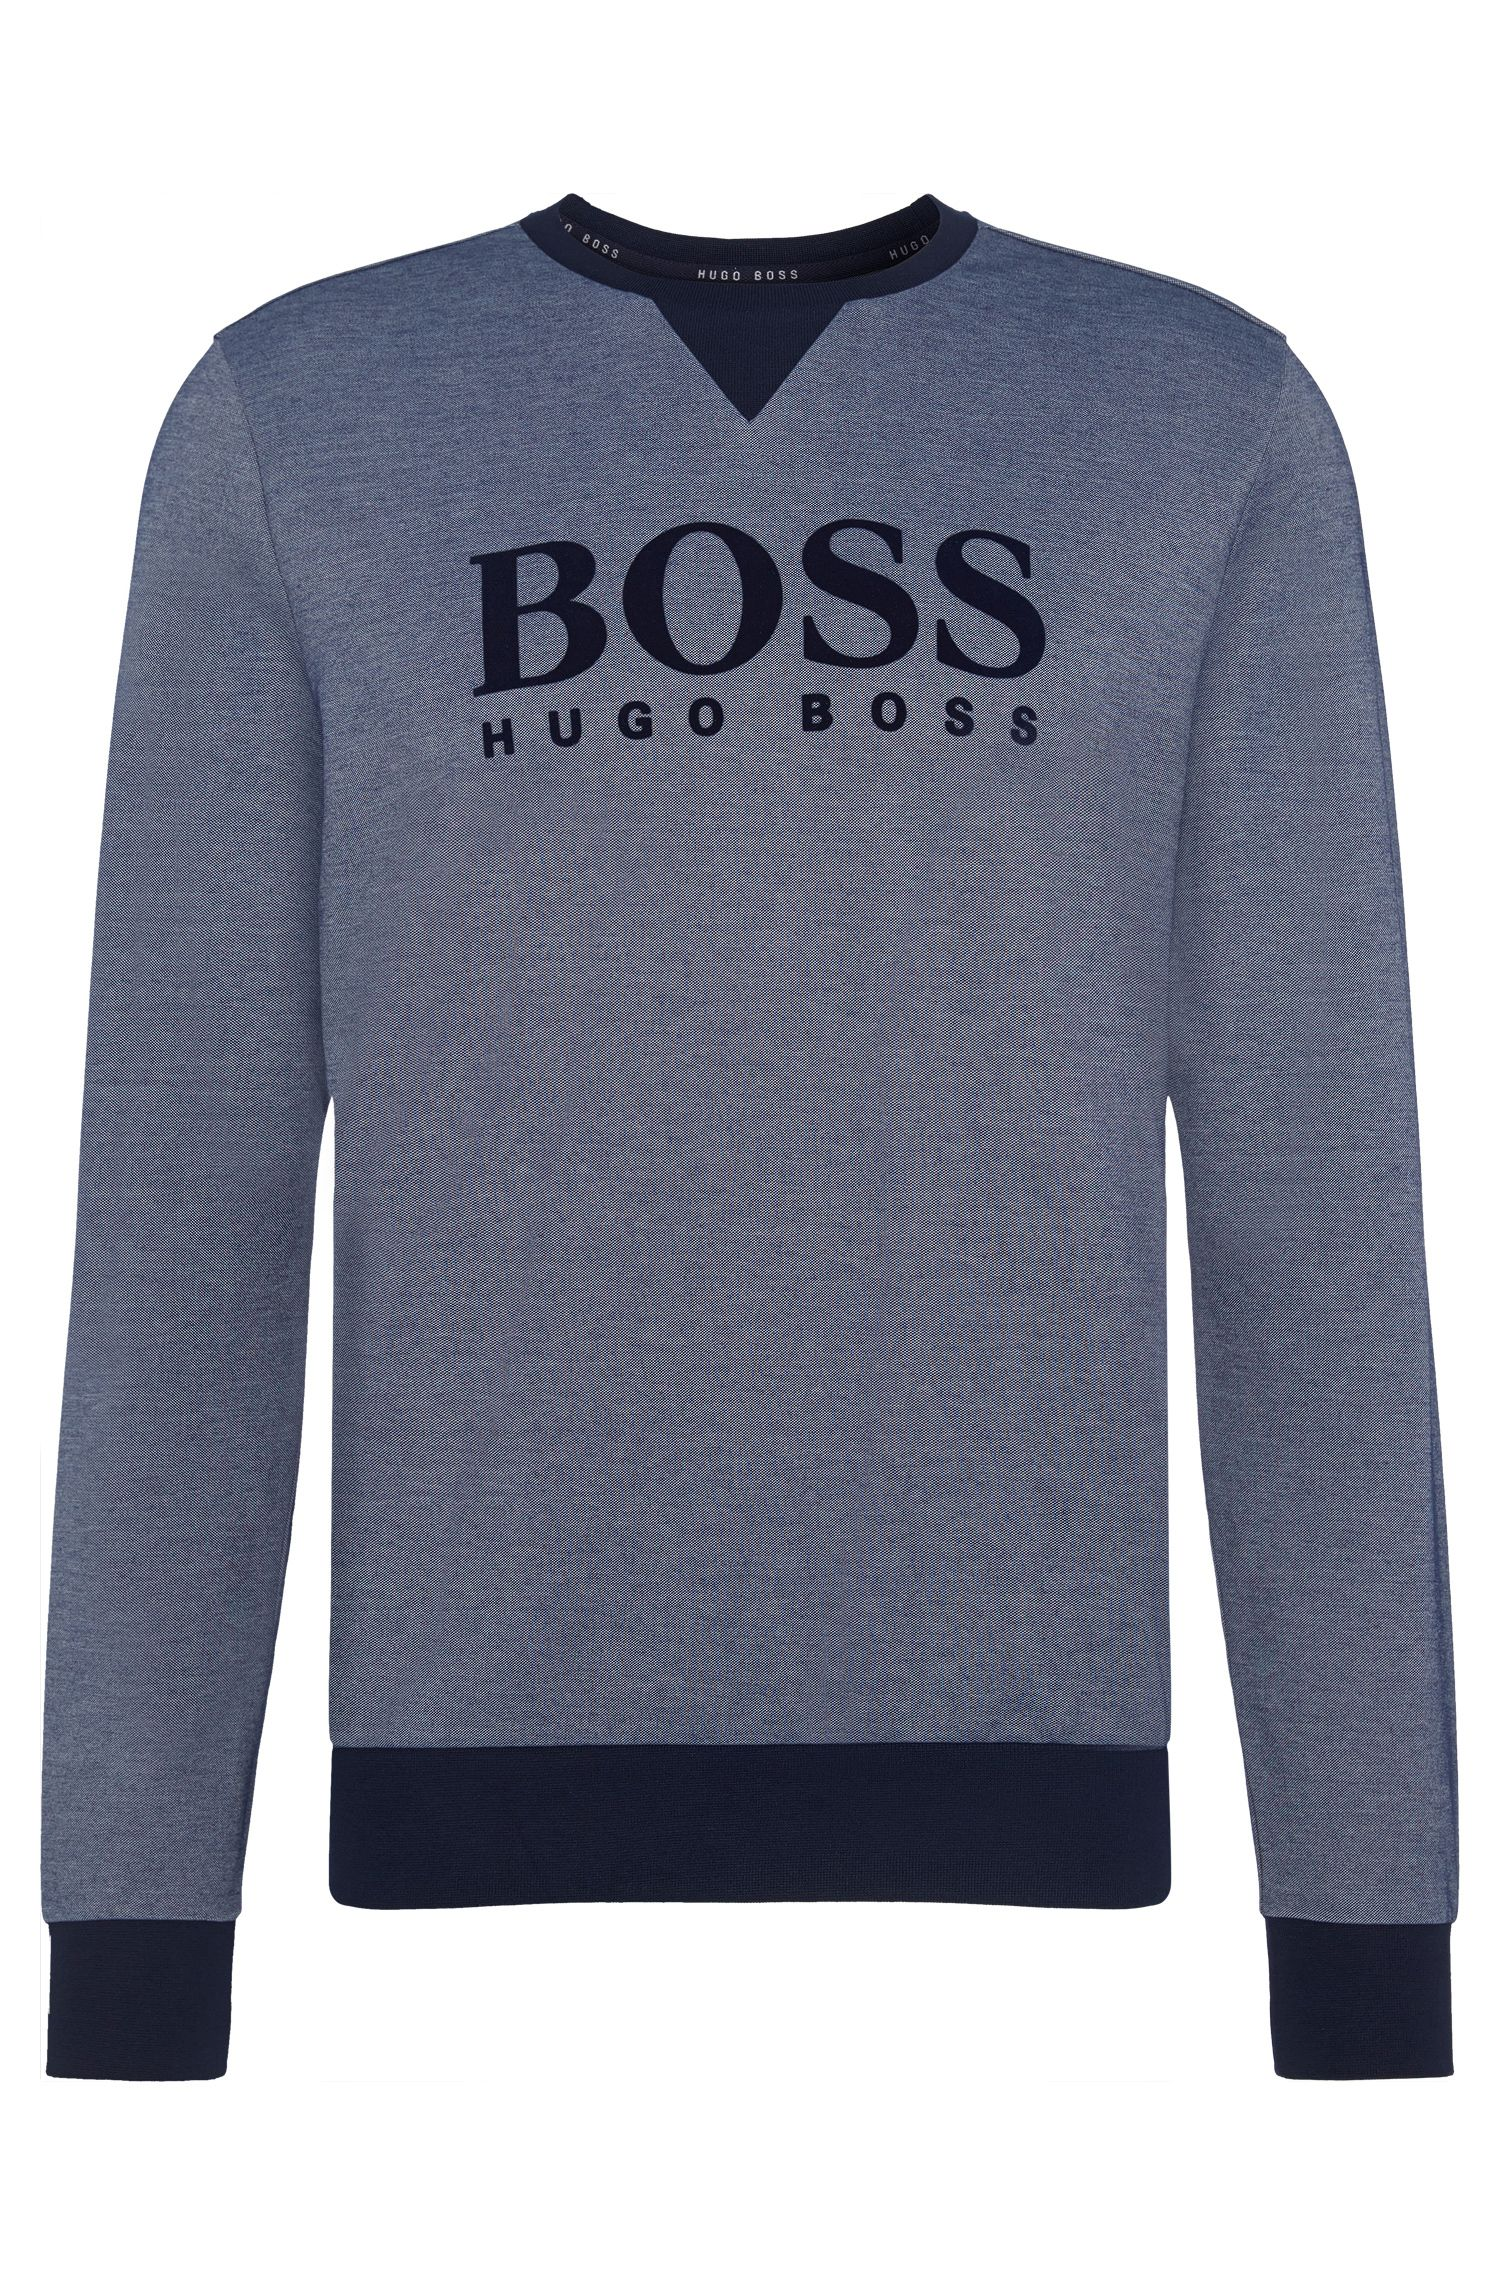 Cotton Blend Flock Logo Sweatshirt   Sweatshirt